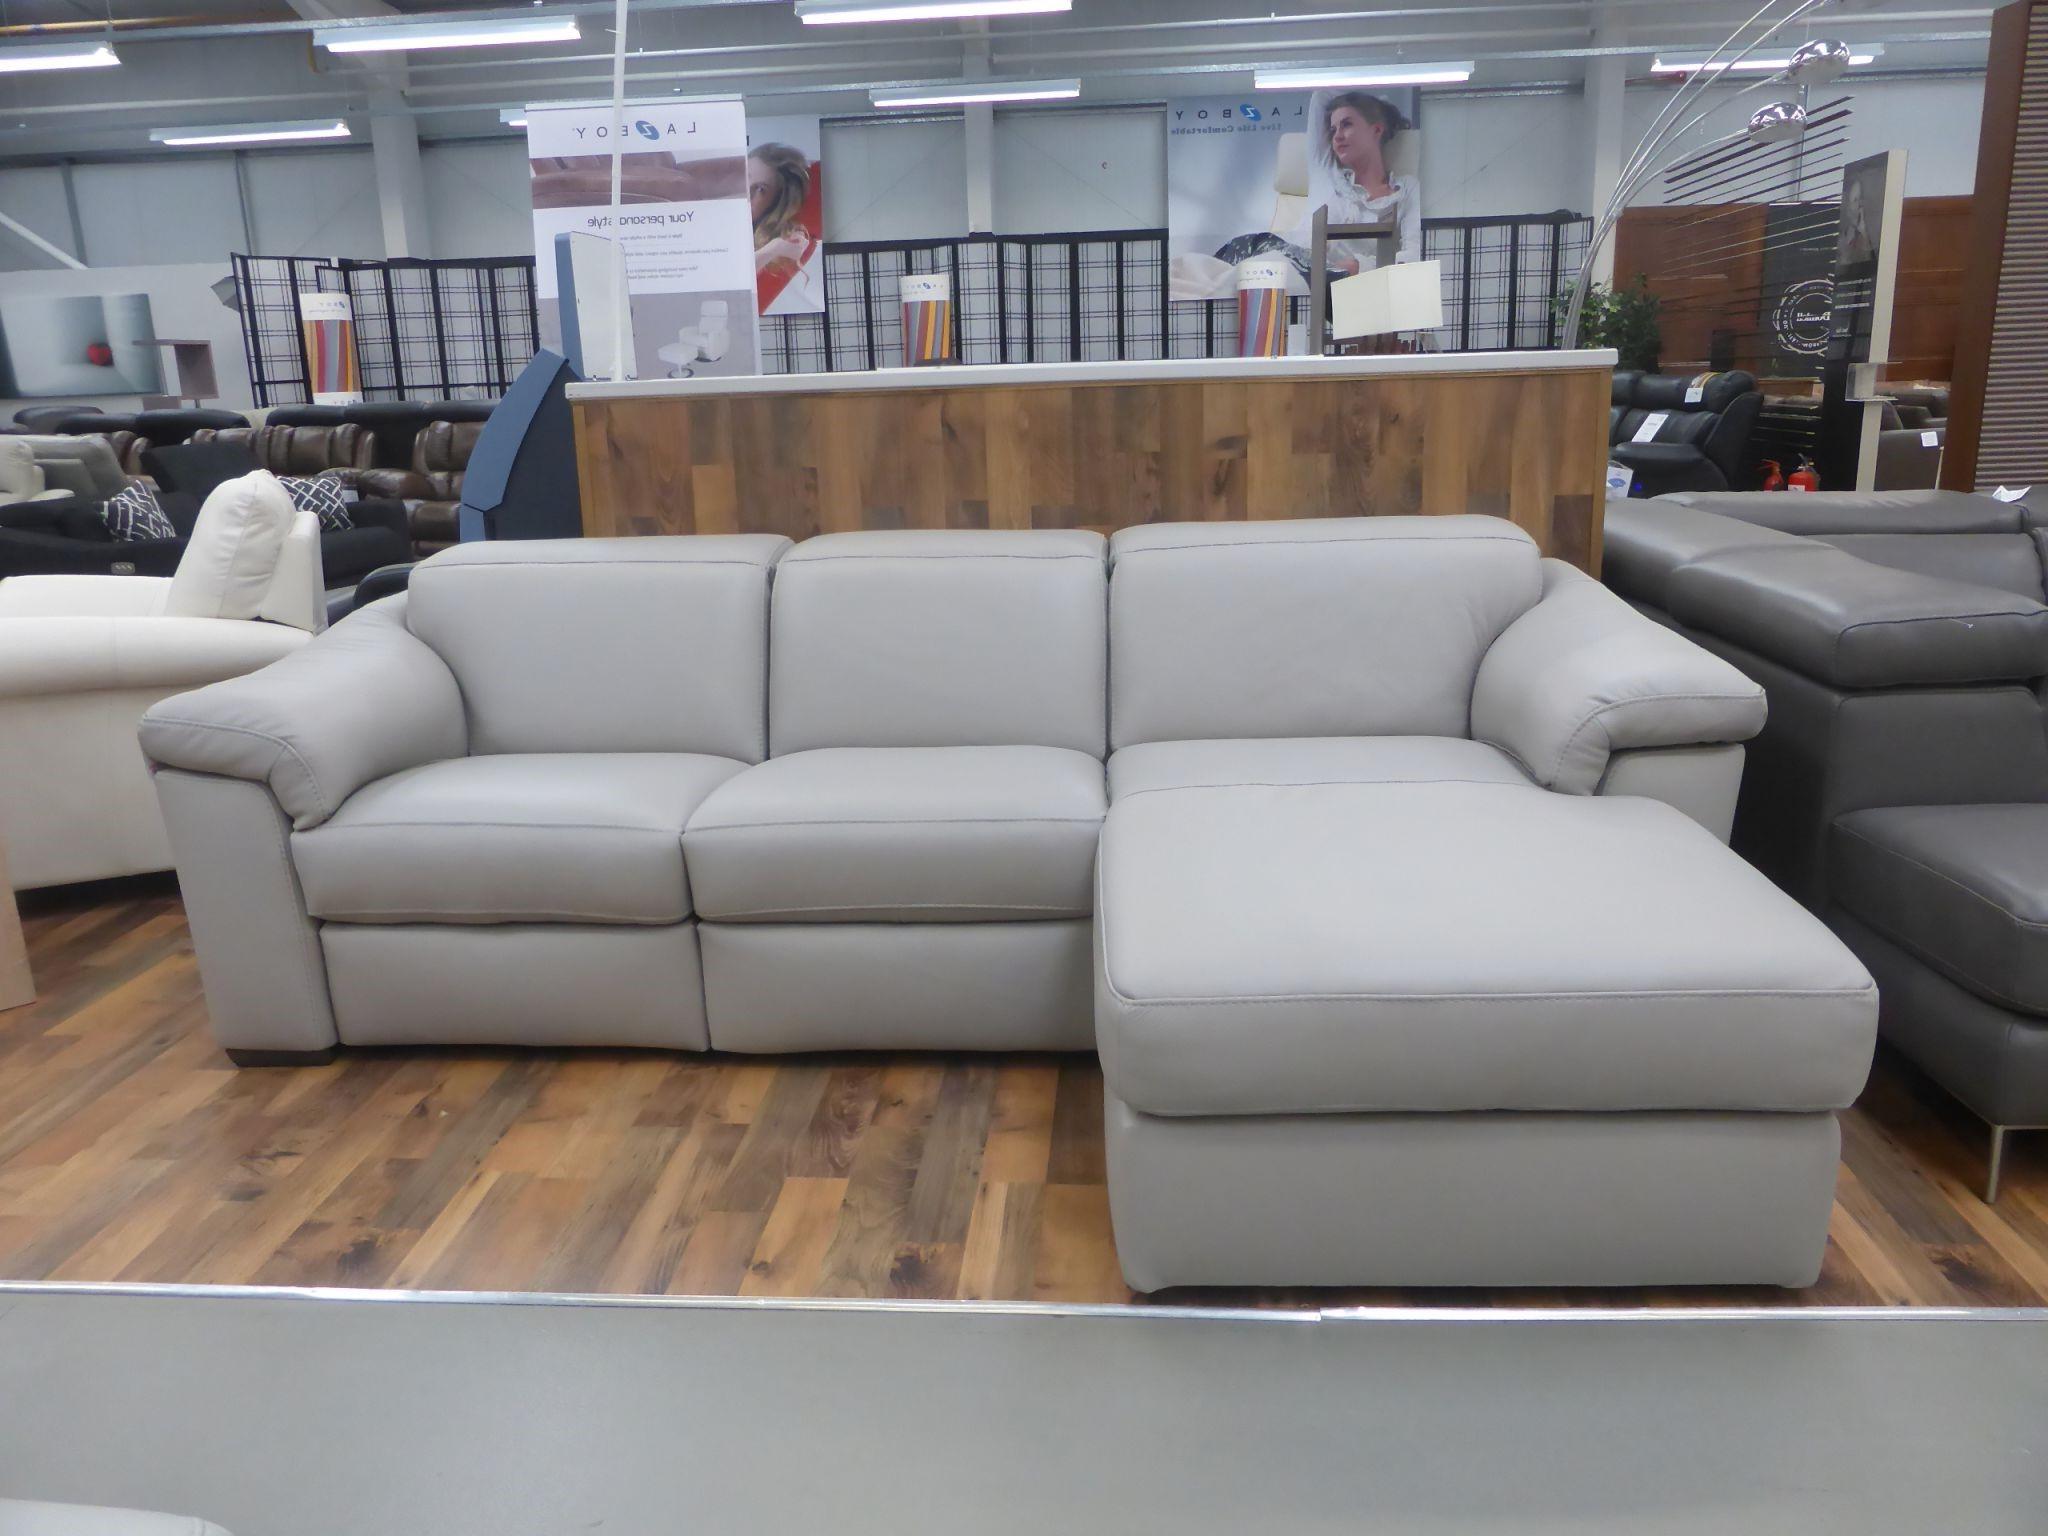 leather sofa covers ready made uk marshfield natuzzi b760 sensor michelle r h chaise grey